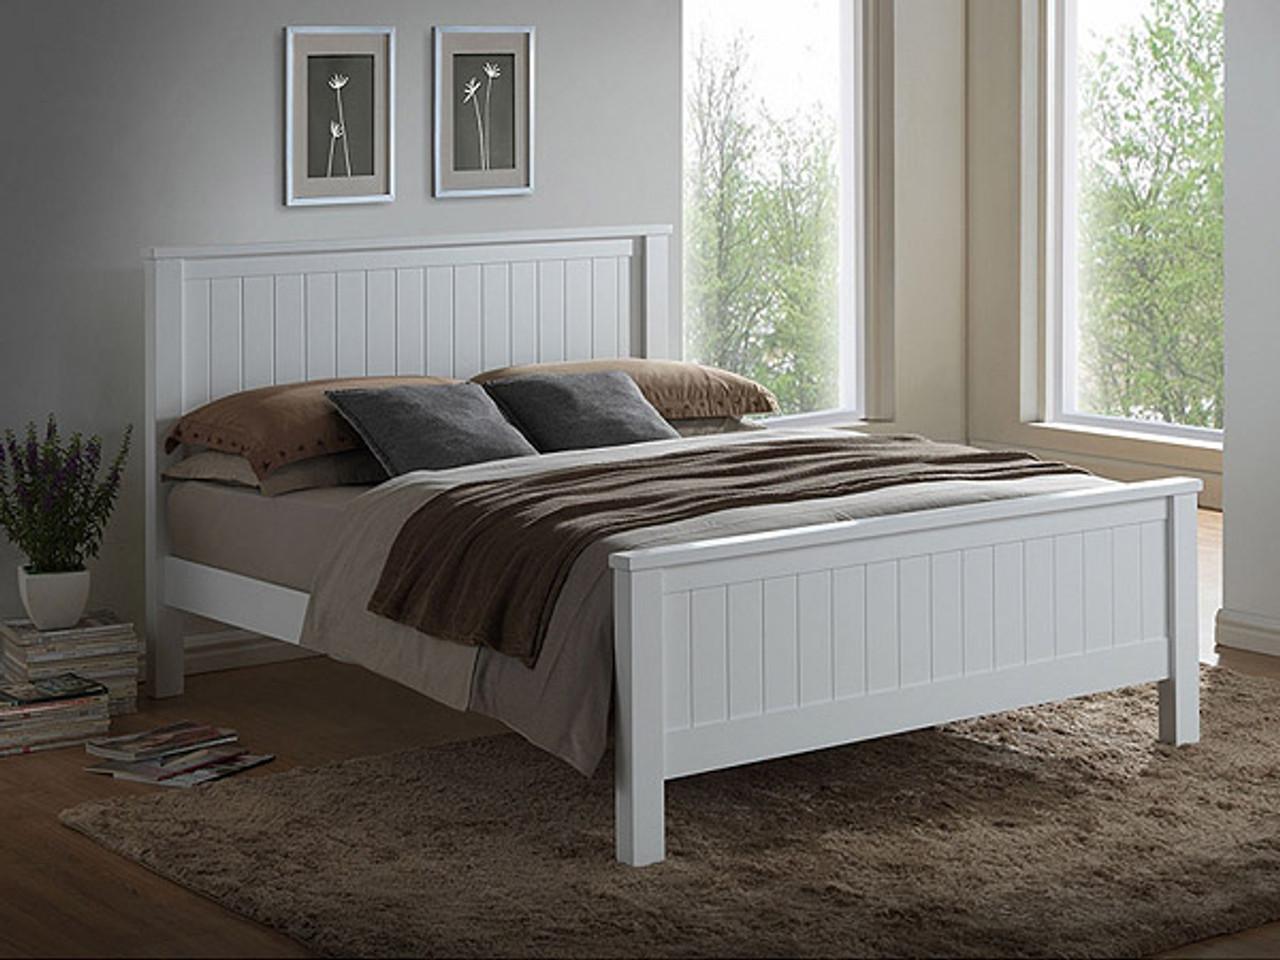 Brodie Queen Bed Djc Furniture Bedding